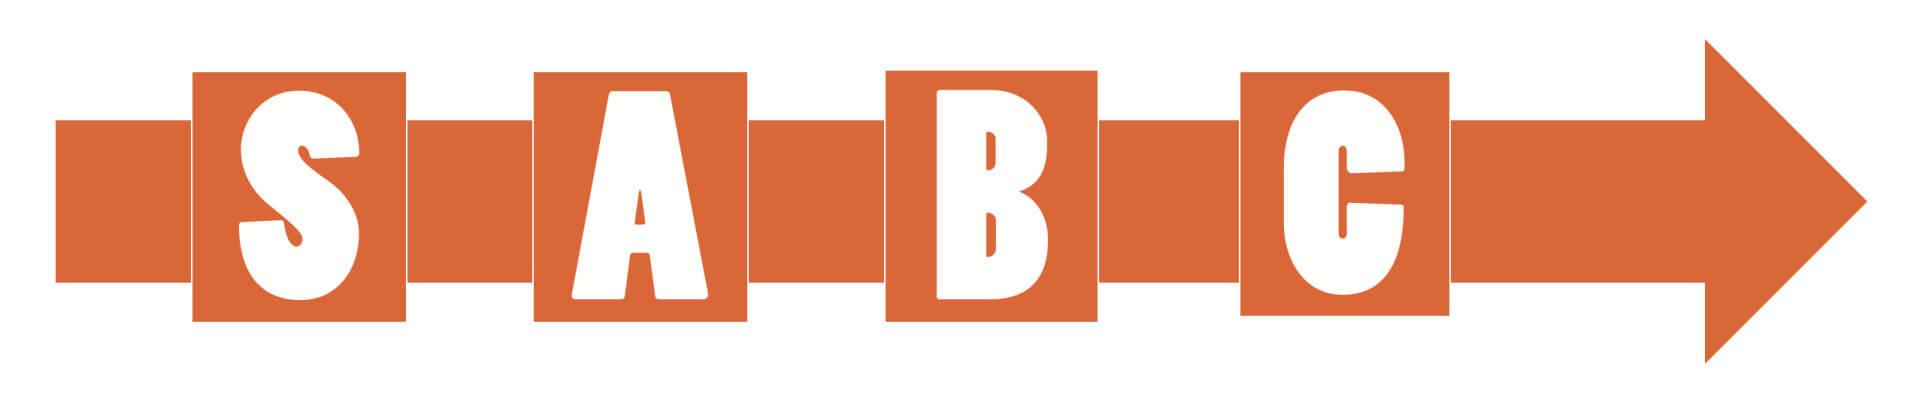 Vad betyder S-ABC | Eldupphör